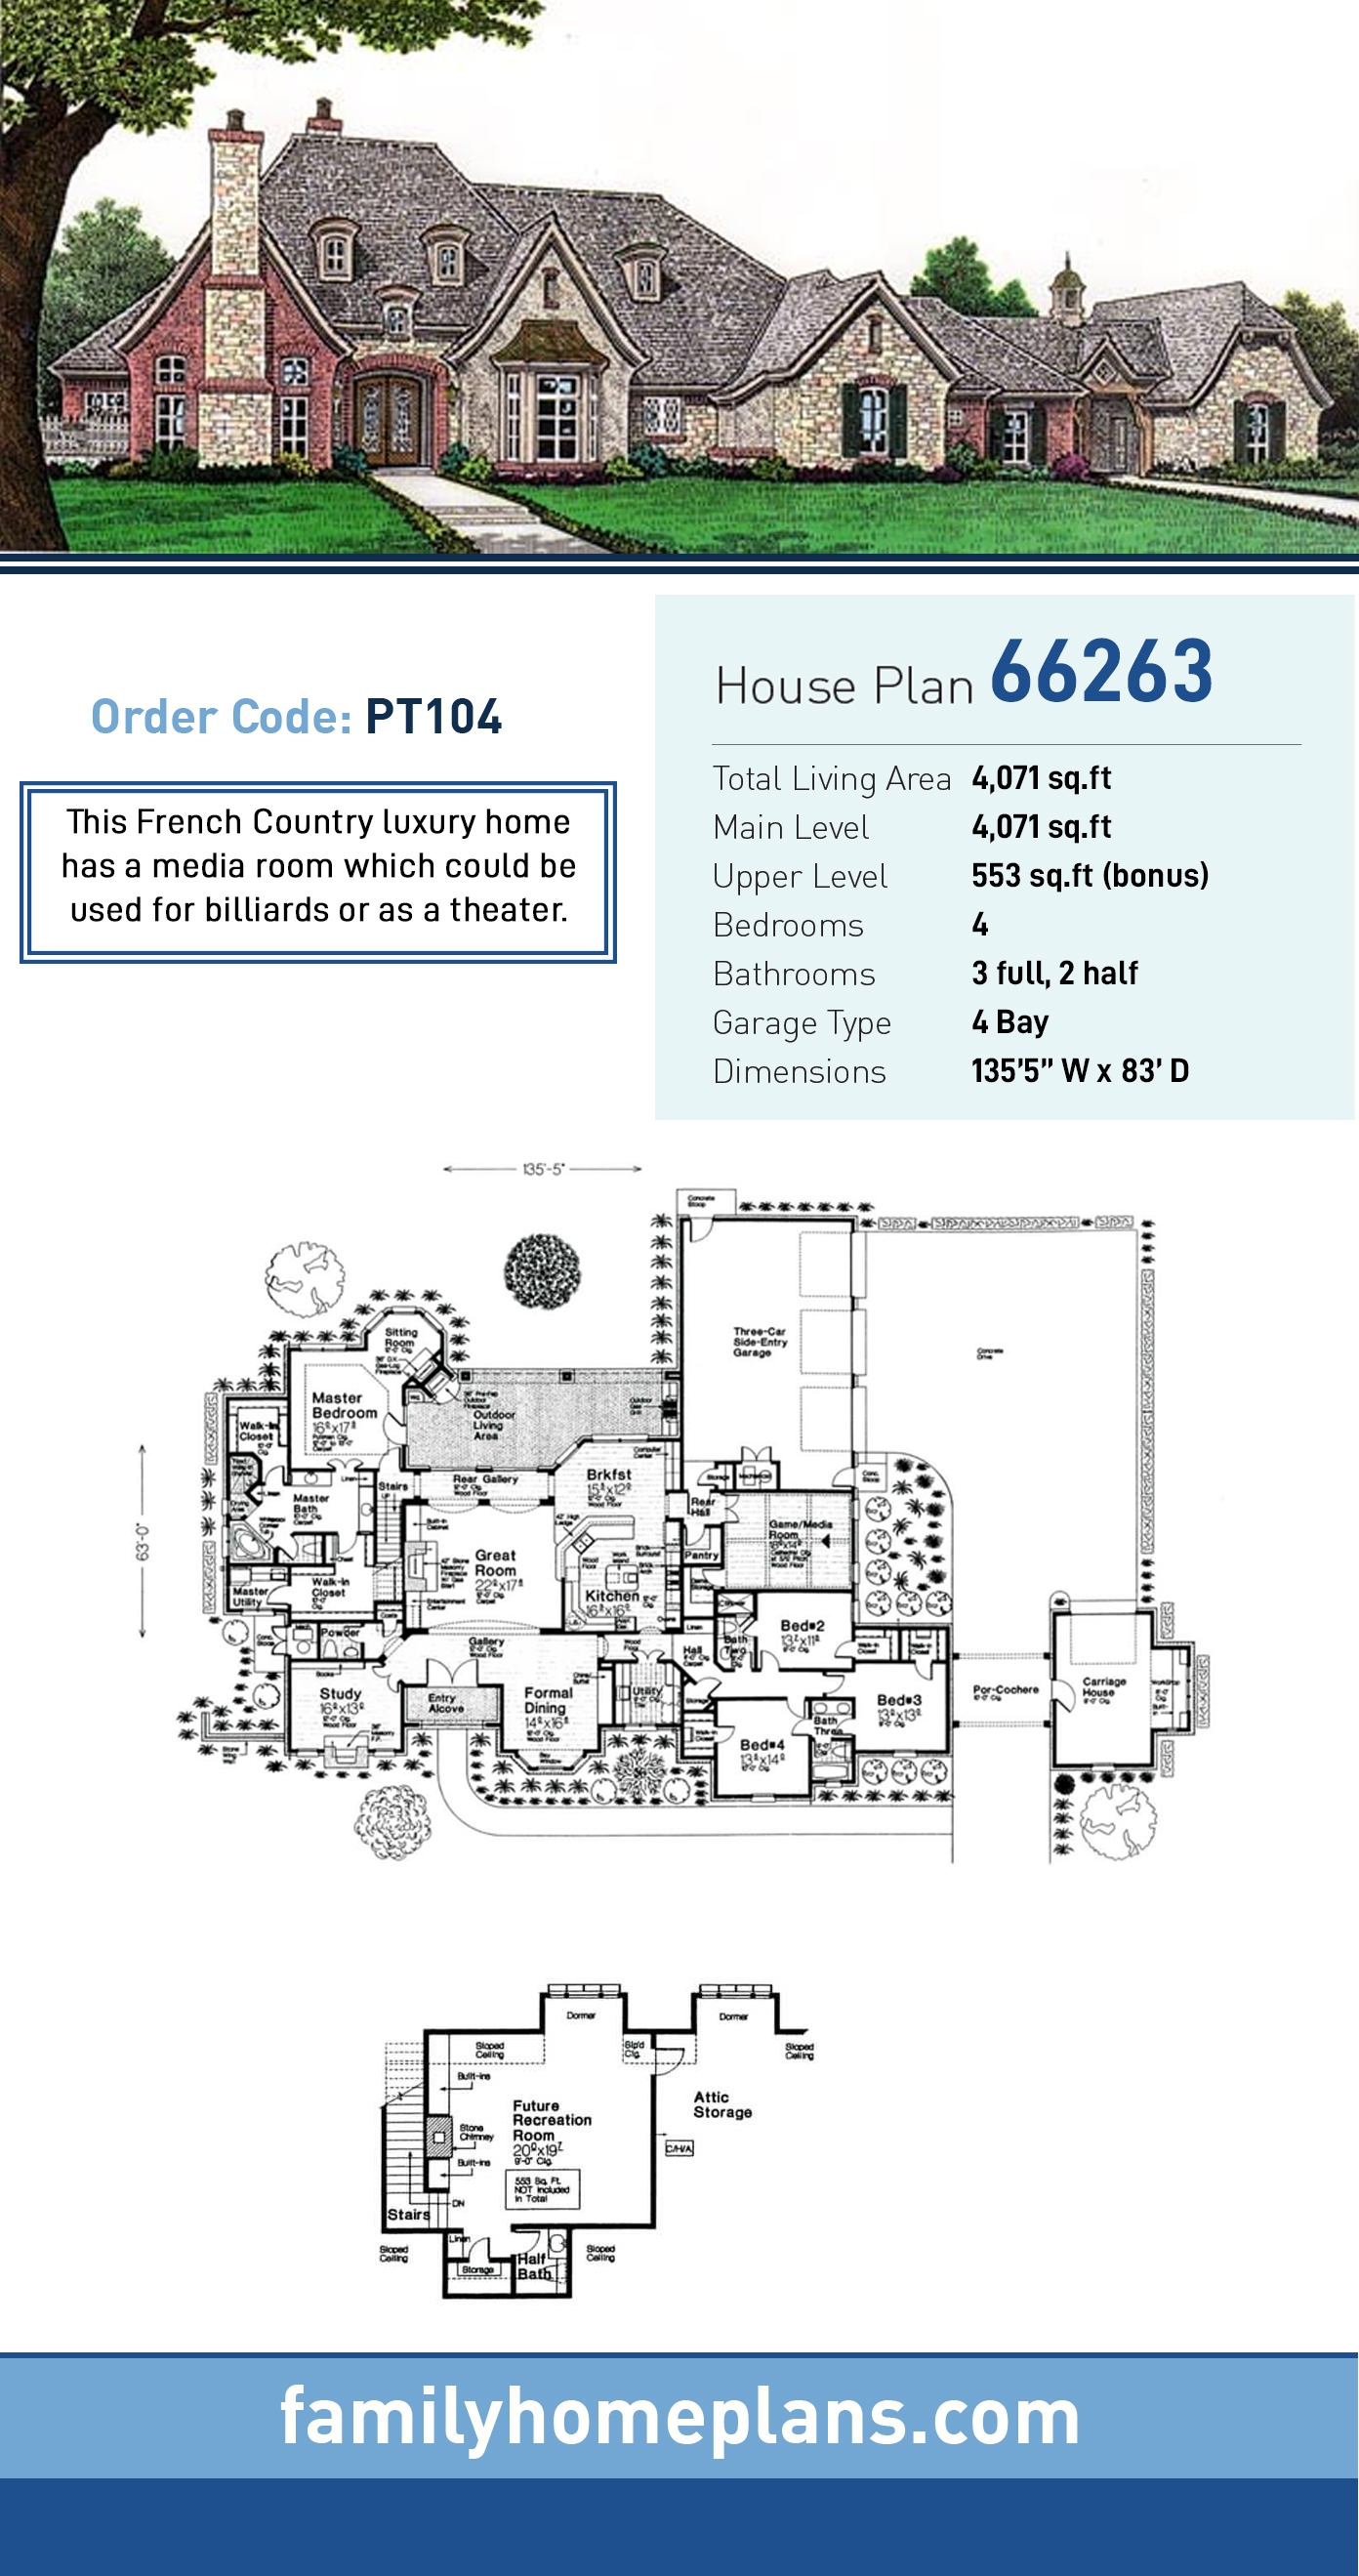 European House Plan 66263 with 4 Beds, 5 Baths, 4 Car Garage